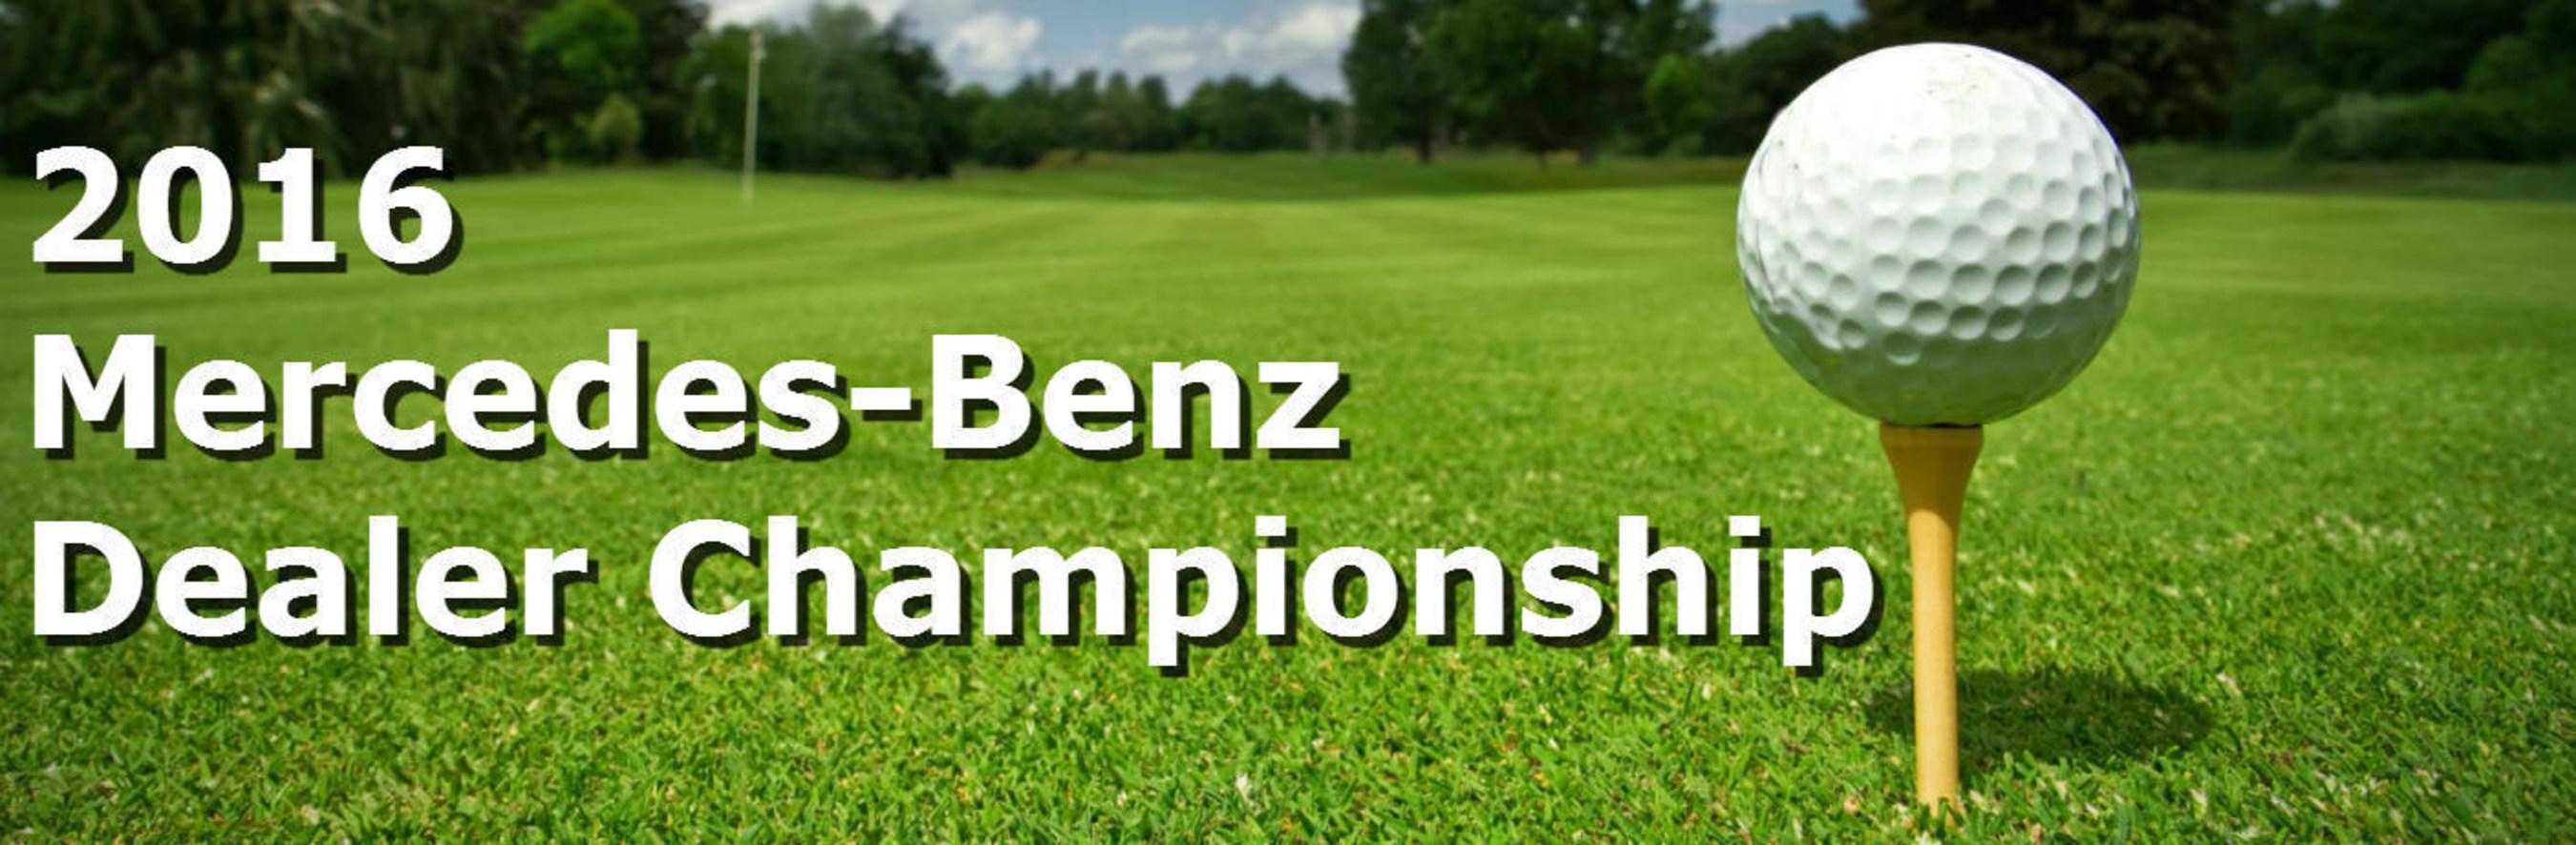 Mercedes benz of arrowhead hosts public golf outing for Arrowhead mercedes benz